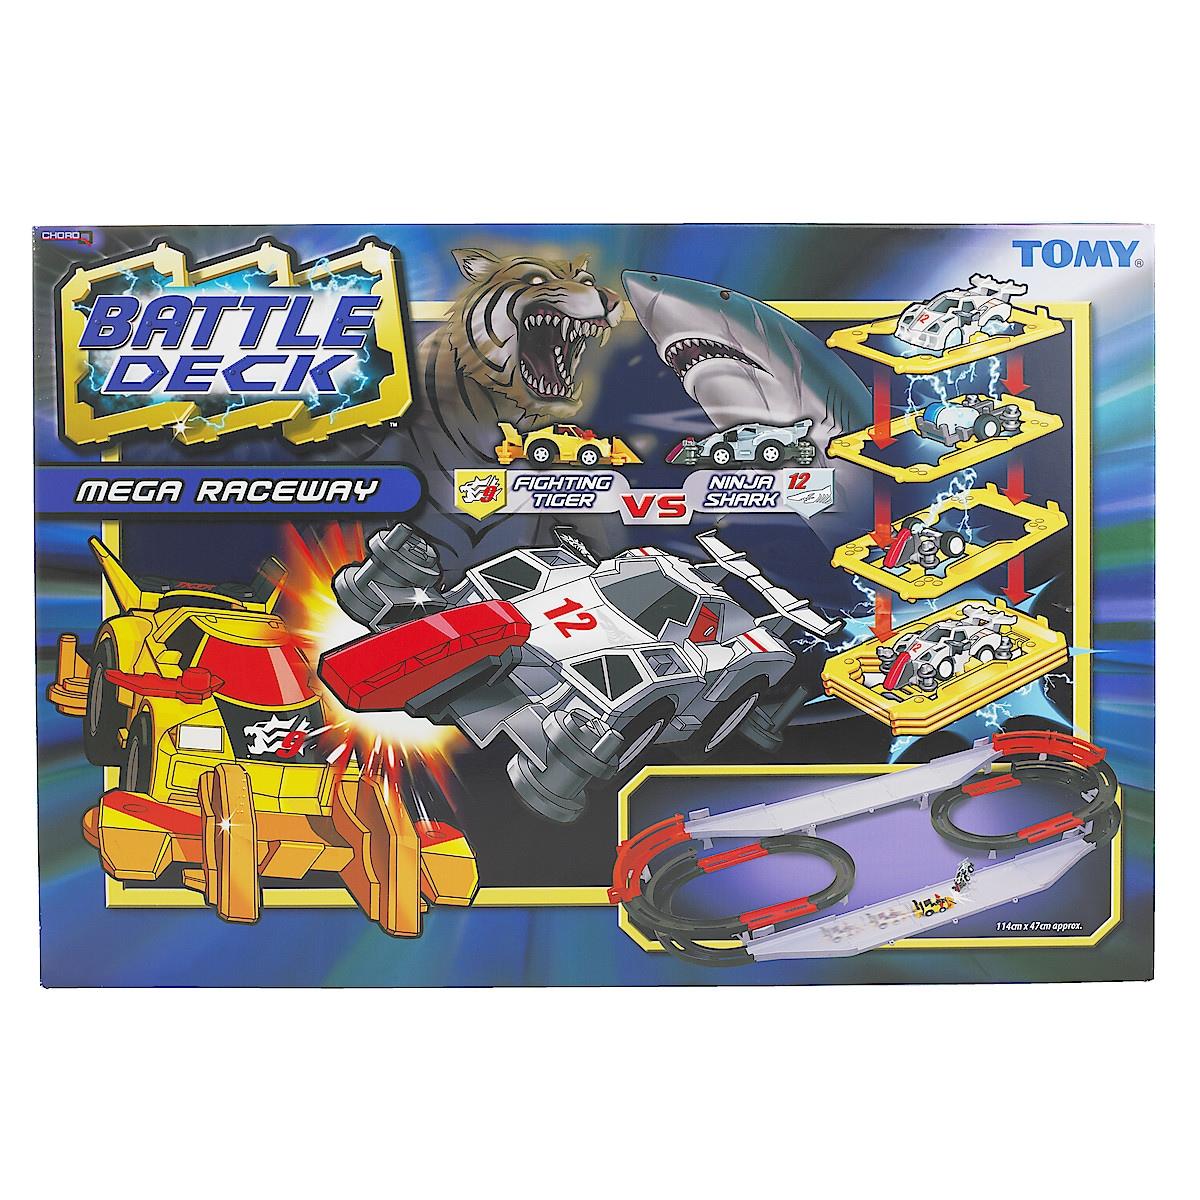 Bilbane, Battle Deck Mega Tomy